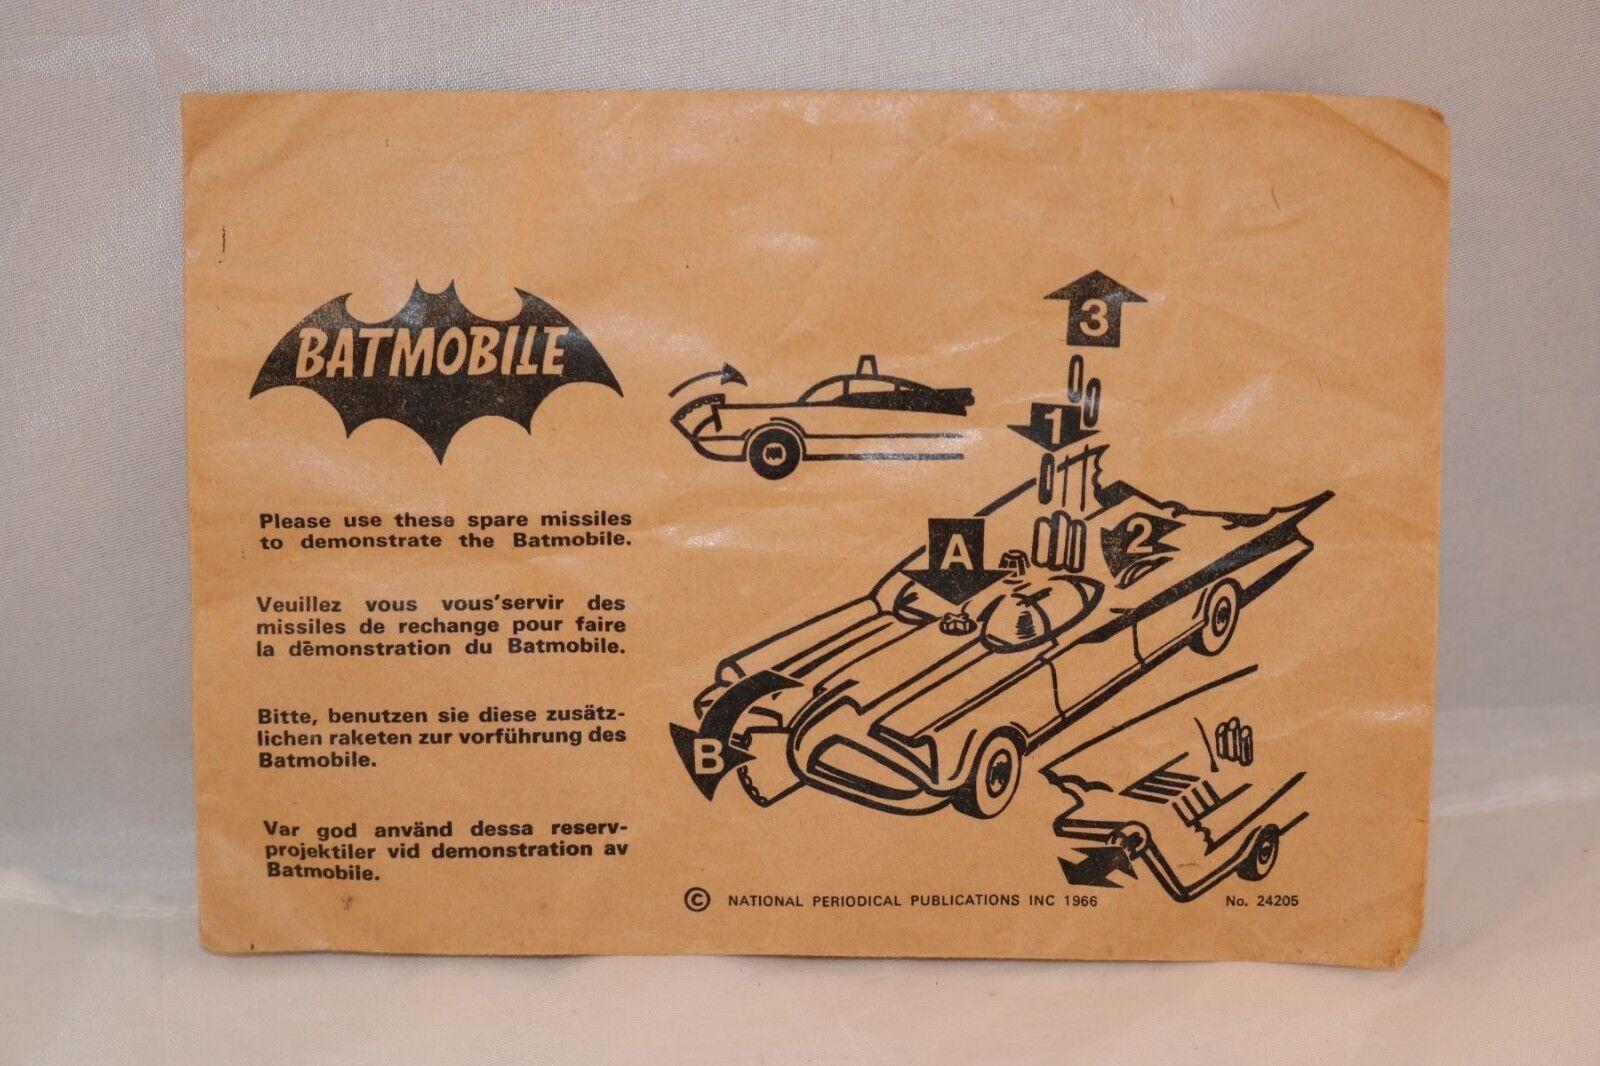 Corgi Toys Toys Toys 267 24205 empty envelope for Batmobile spare missiles very scarce. ec2fda